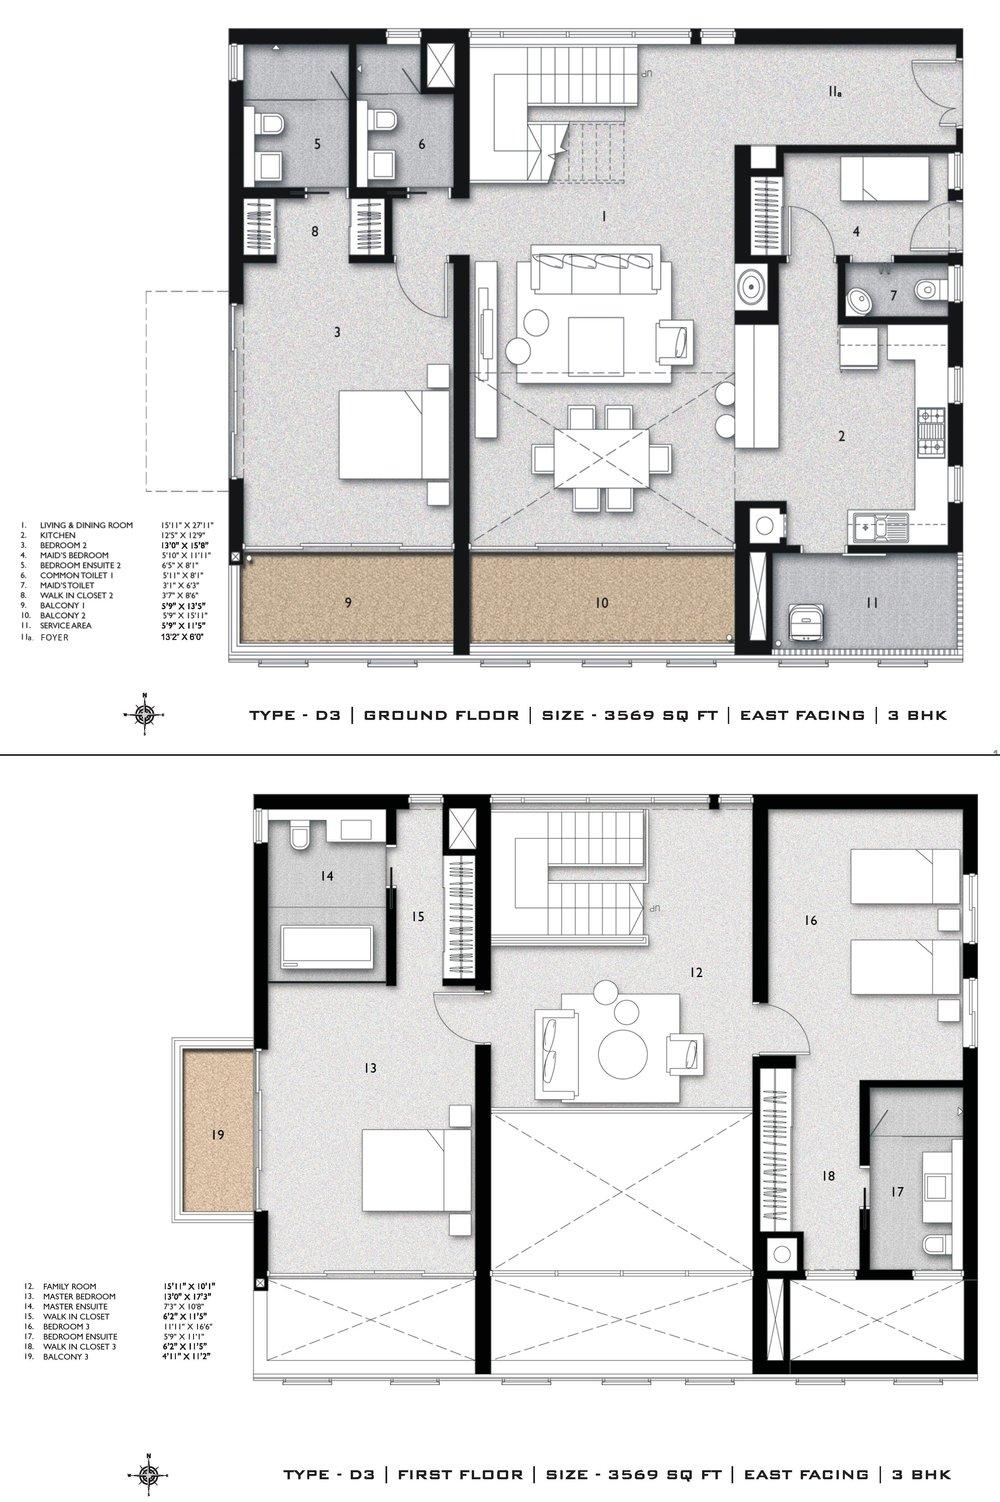 Duplex_3569 sft.jpg